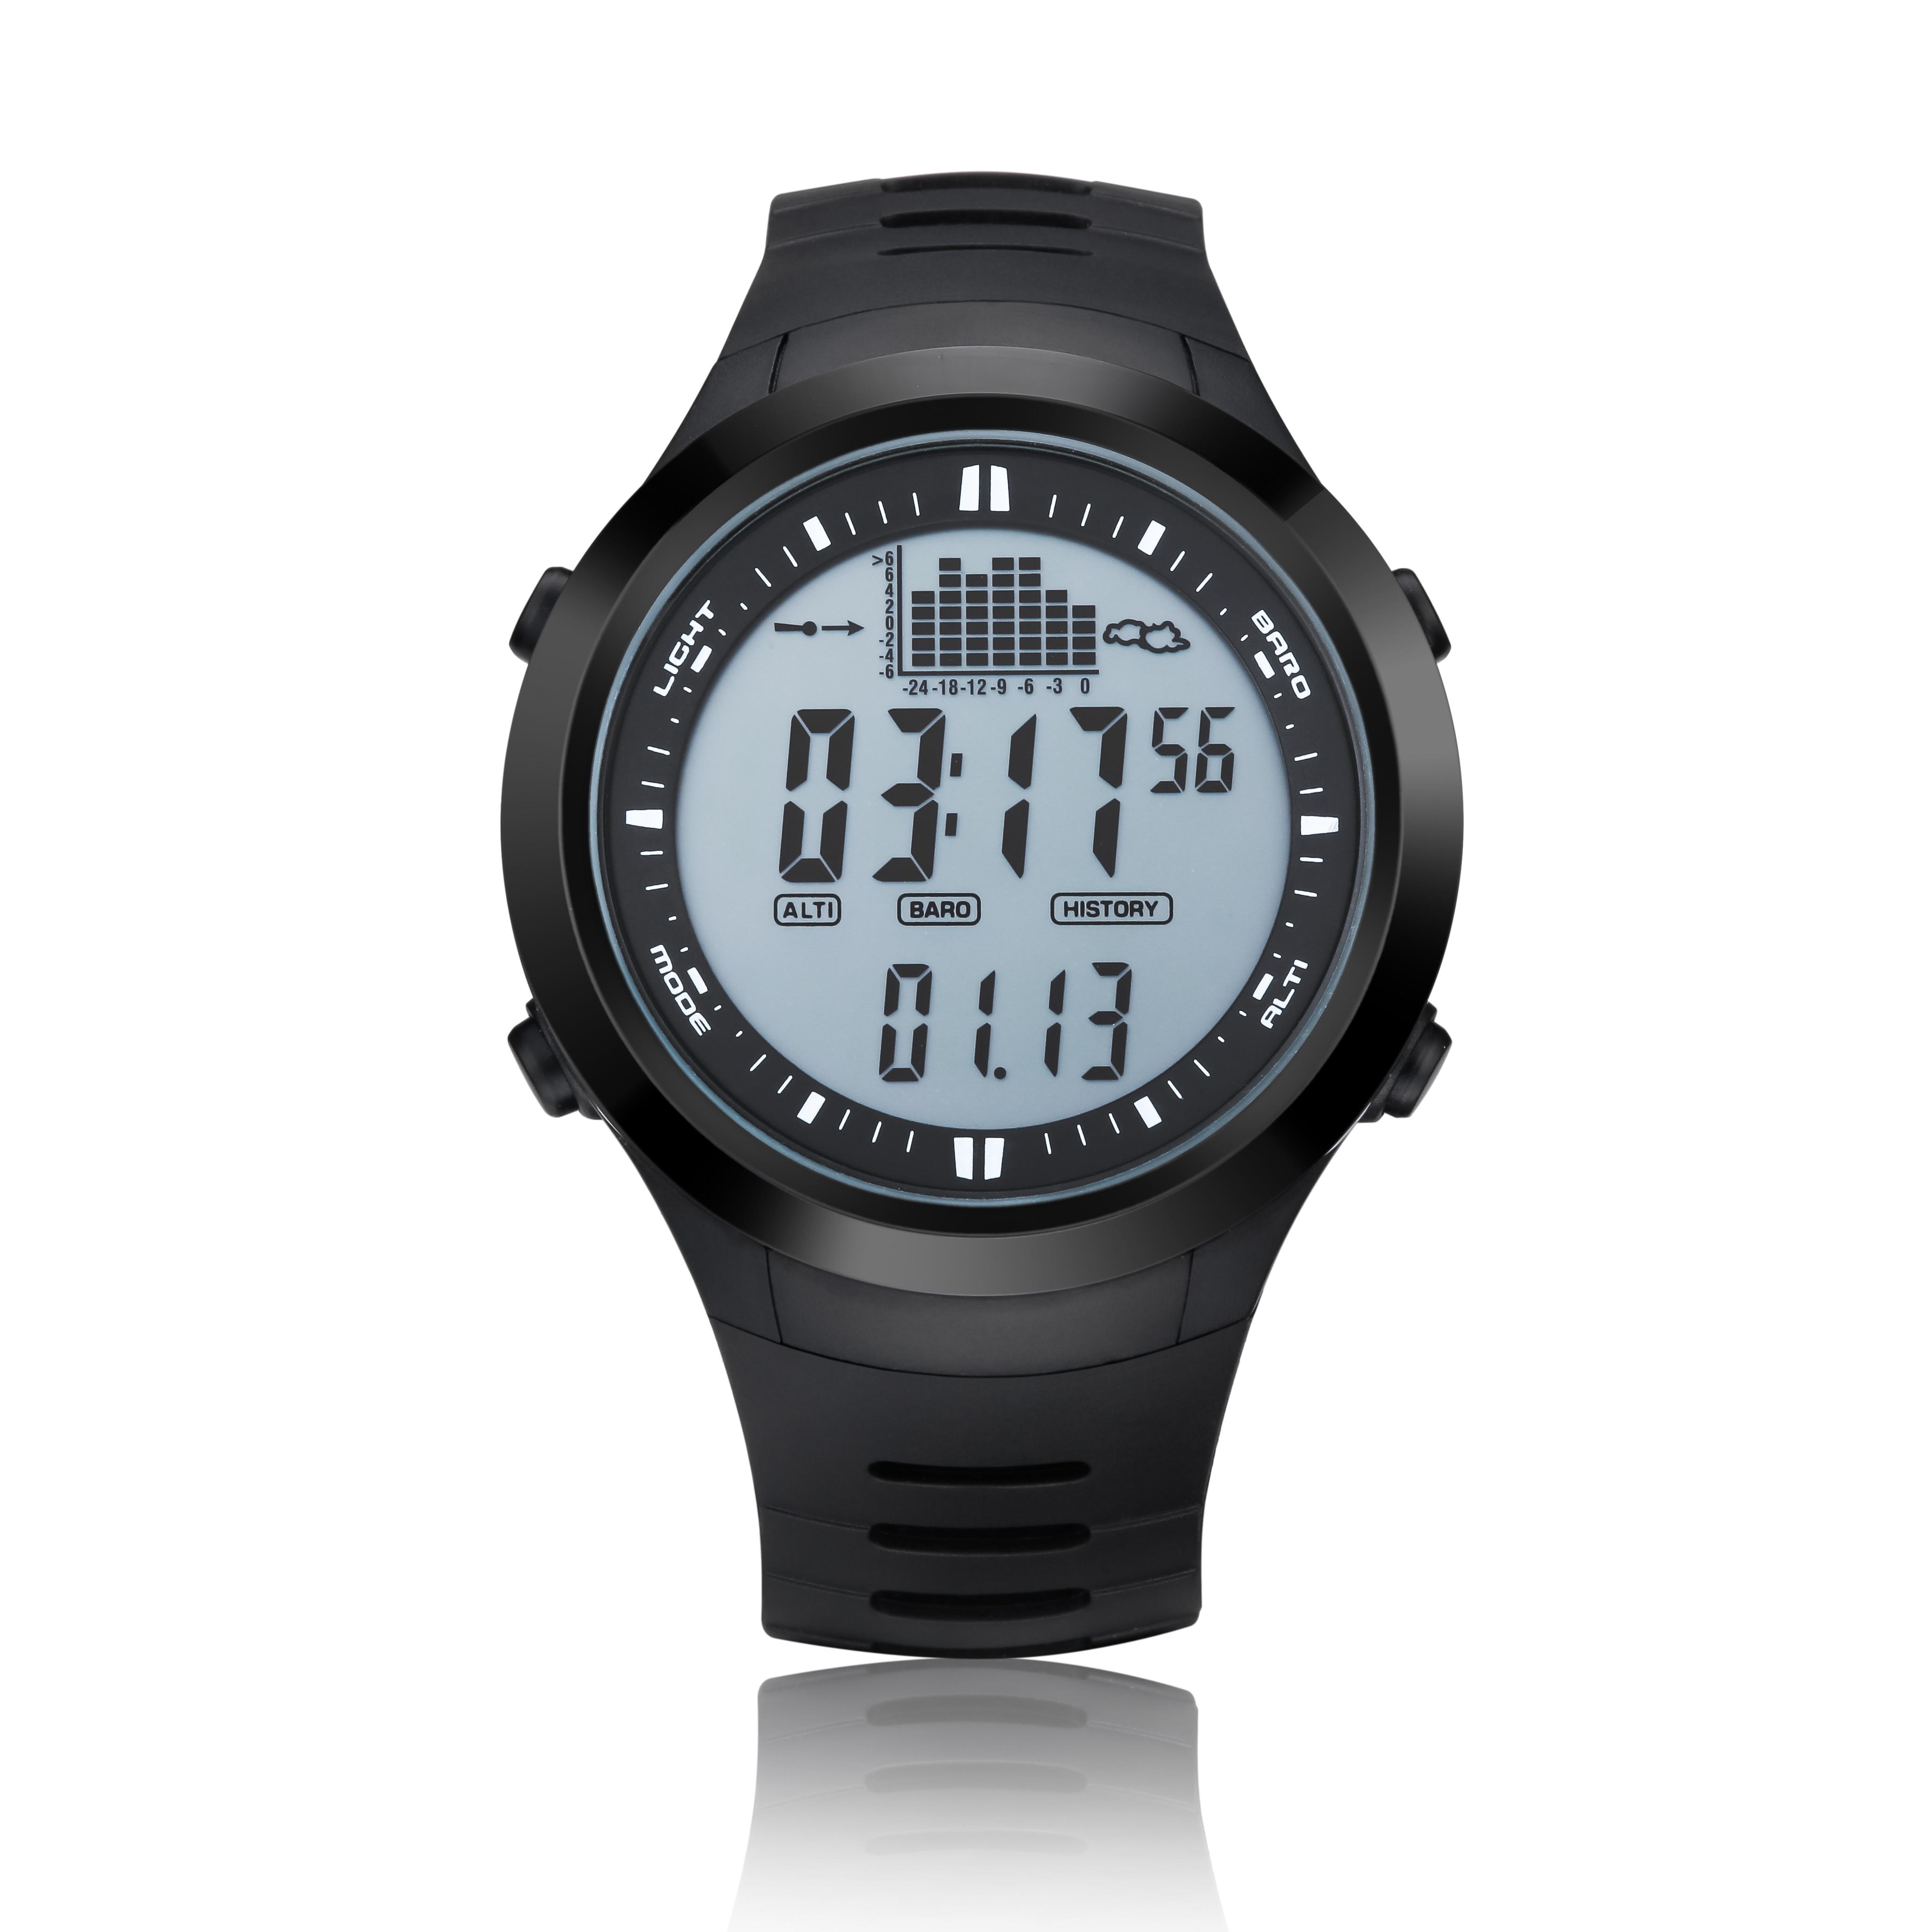 Fishing Watch Barometer 3ATM Waterproof Thermometer Altimeter Men Military Sports Digital Wristwatches Spovan SPV709 2018 New status vac rec 05